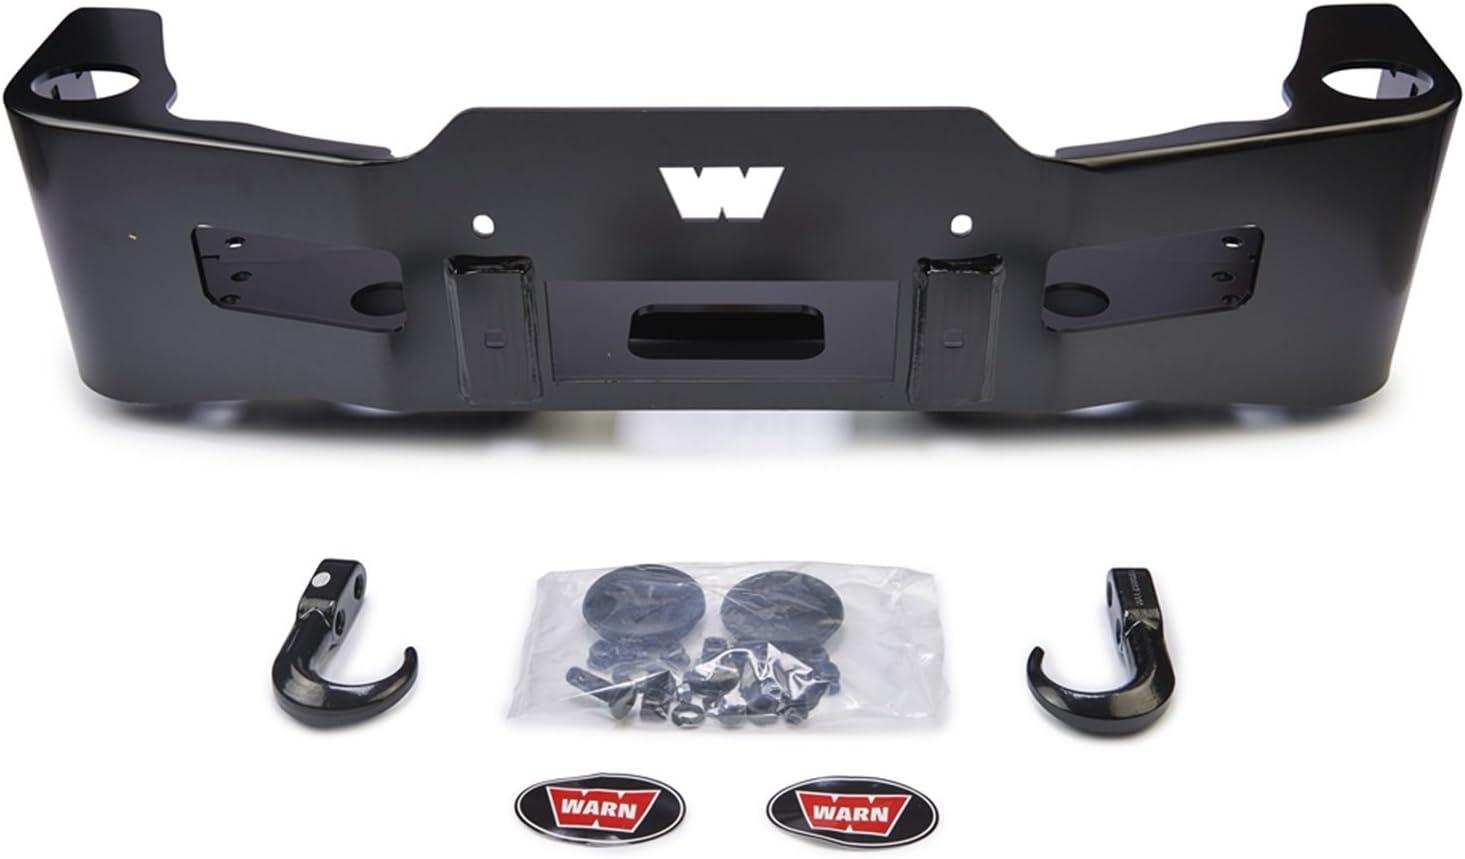 WARN 91405 Winch Carrier